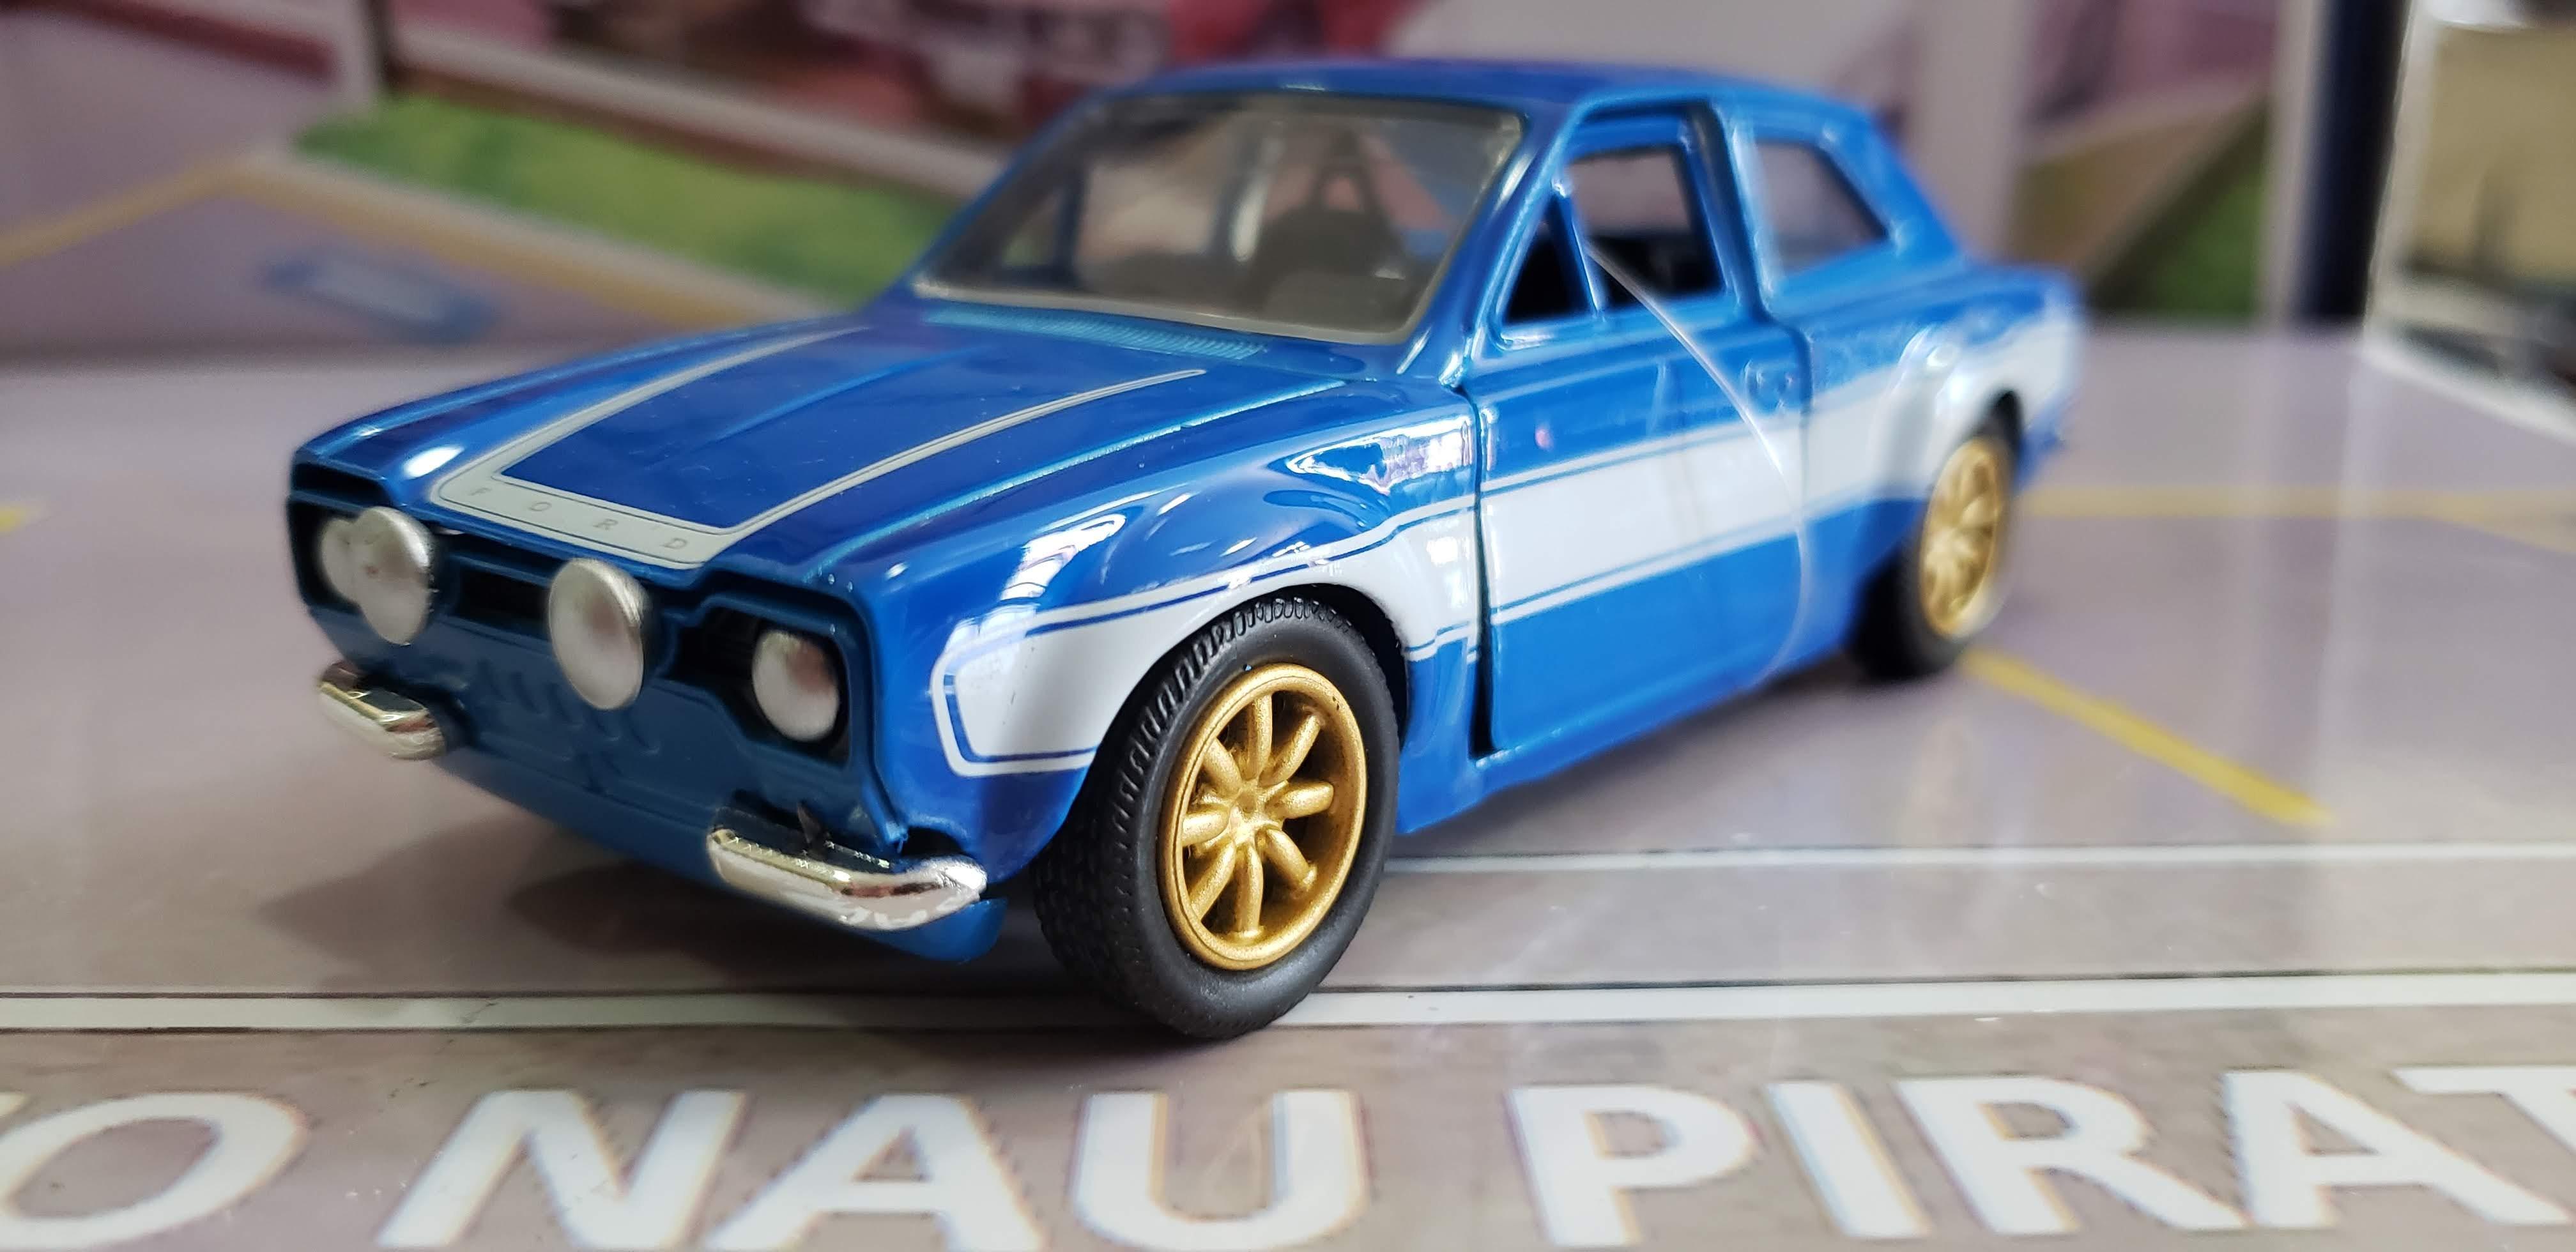 Velozes & Furiosos (Fast & Furious) Brian's Ford Escort 1974 1:32 Jada